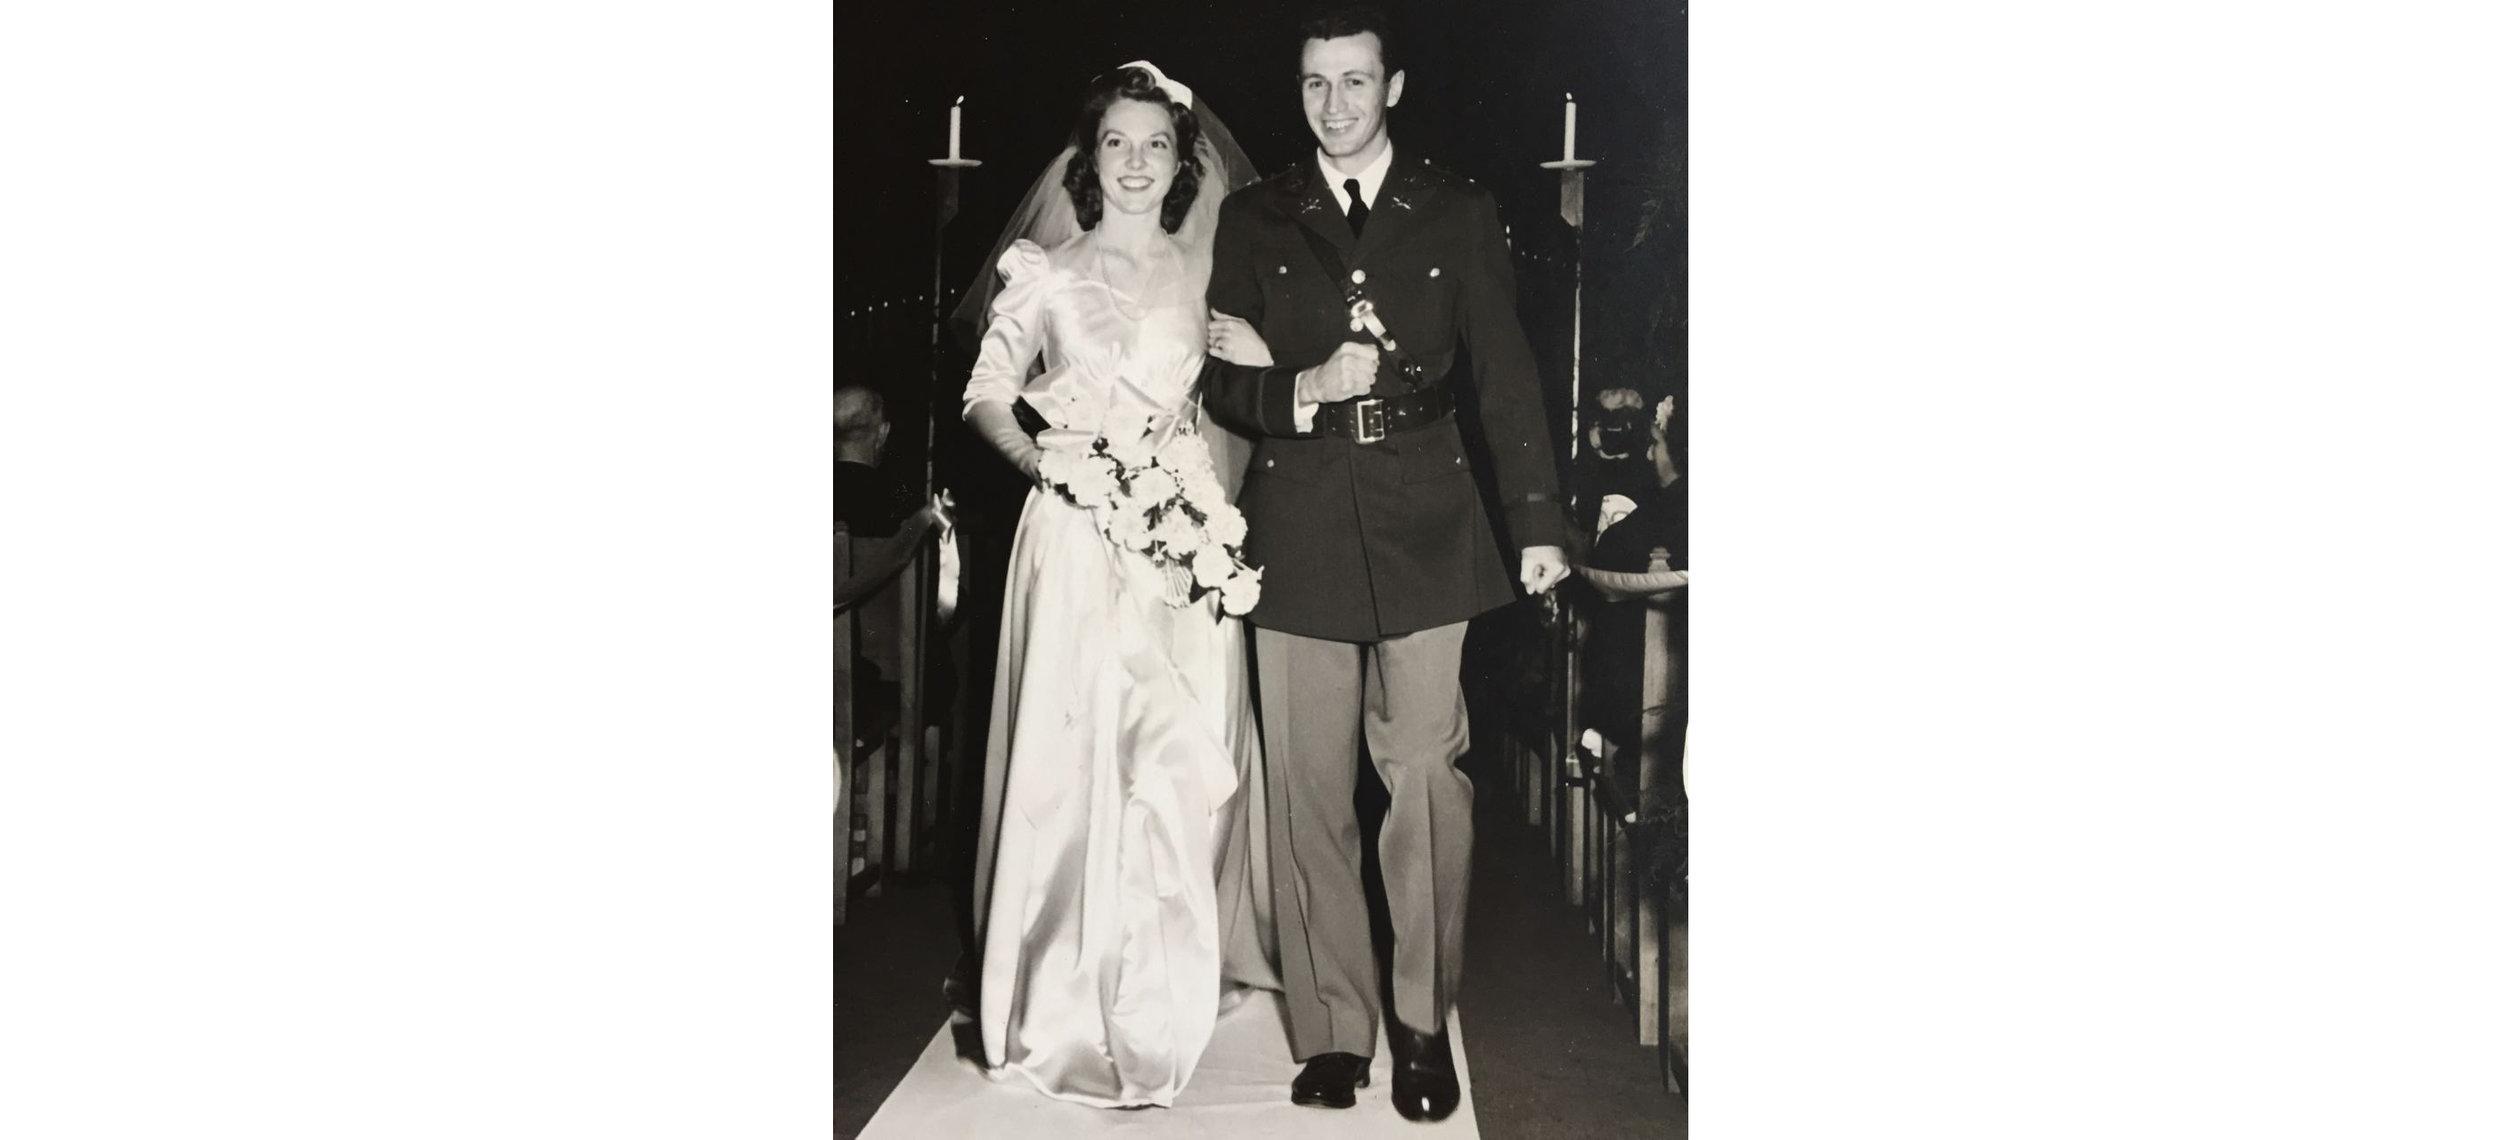 Margaret Howe McCaffery's wedding in 1942, Beverly Hills, California.